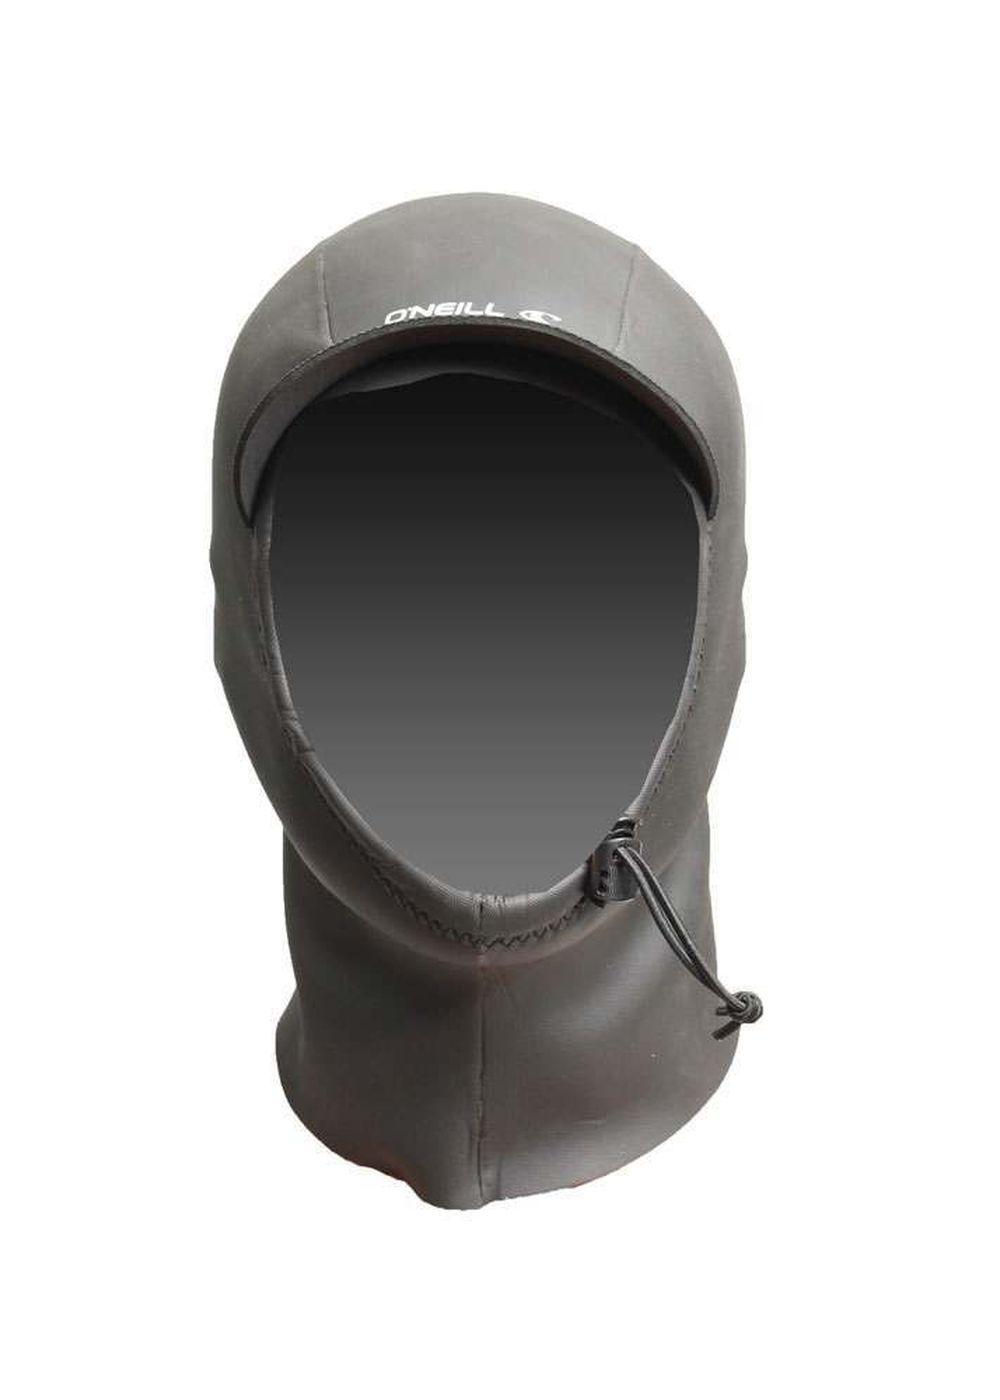 Oneill 1.5mm Hyperfreak Wetsuit Hood Picture